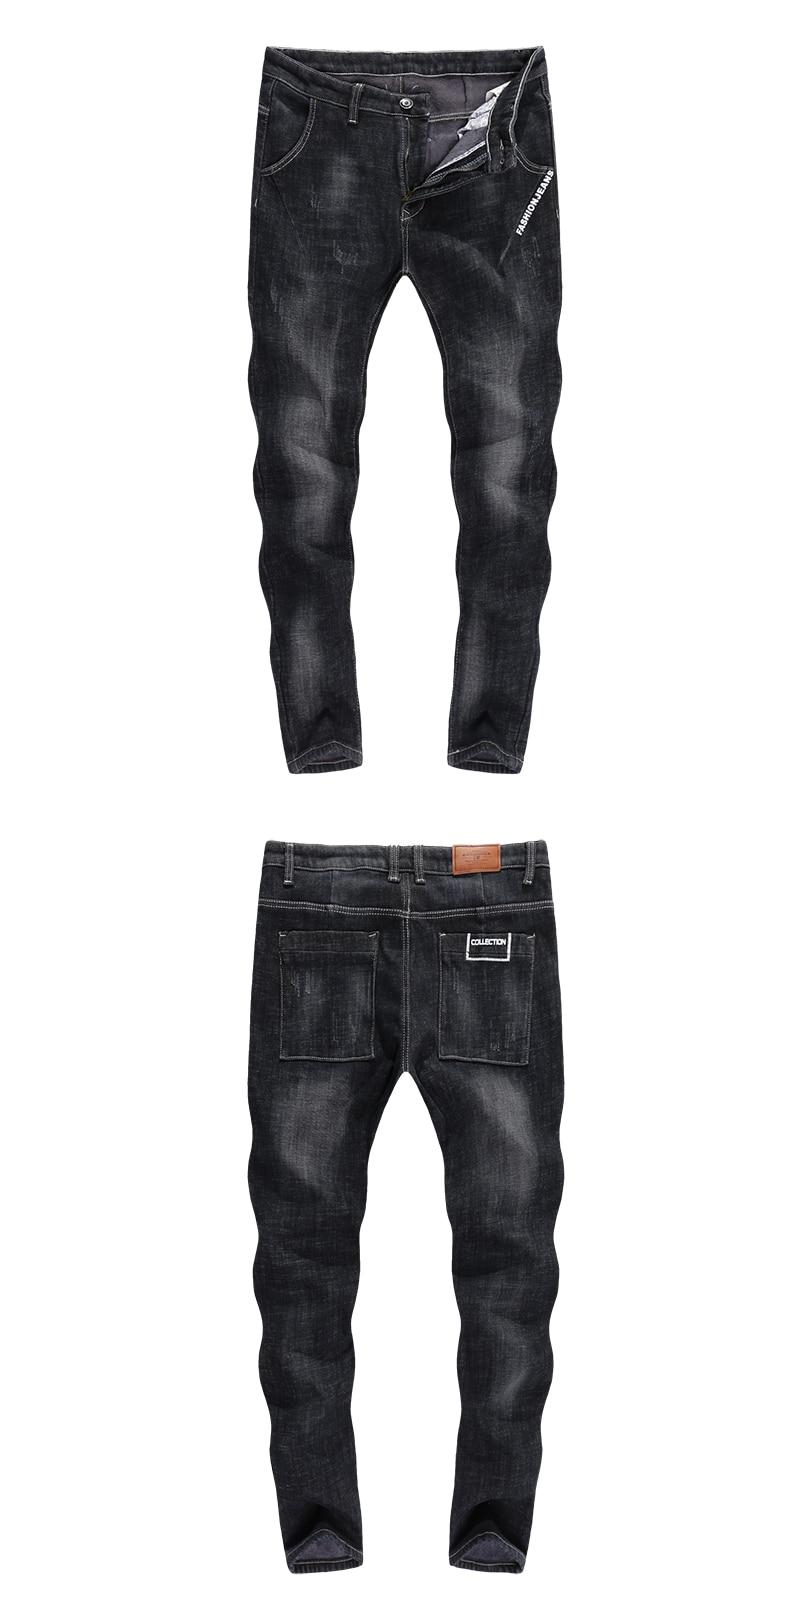 KSTUN Warmer Jeans Men Skinny Harem Pants Black Winter Stretch Slim Leg Tapered Fleece Casual